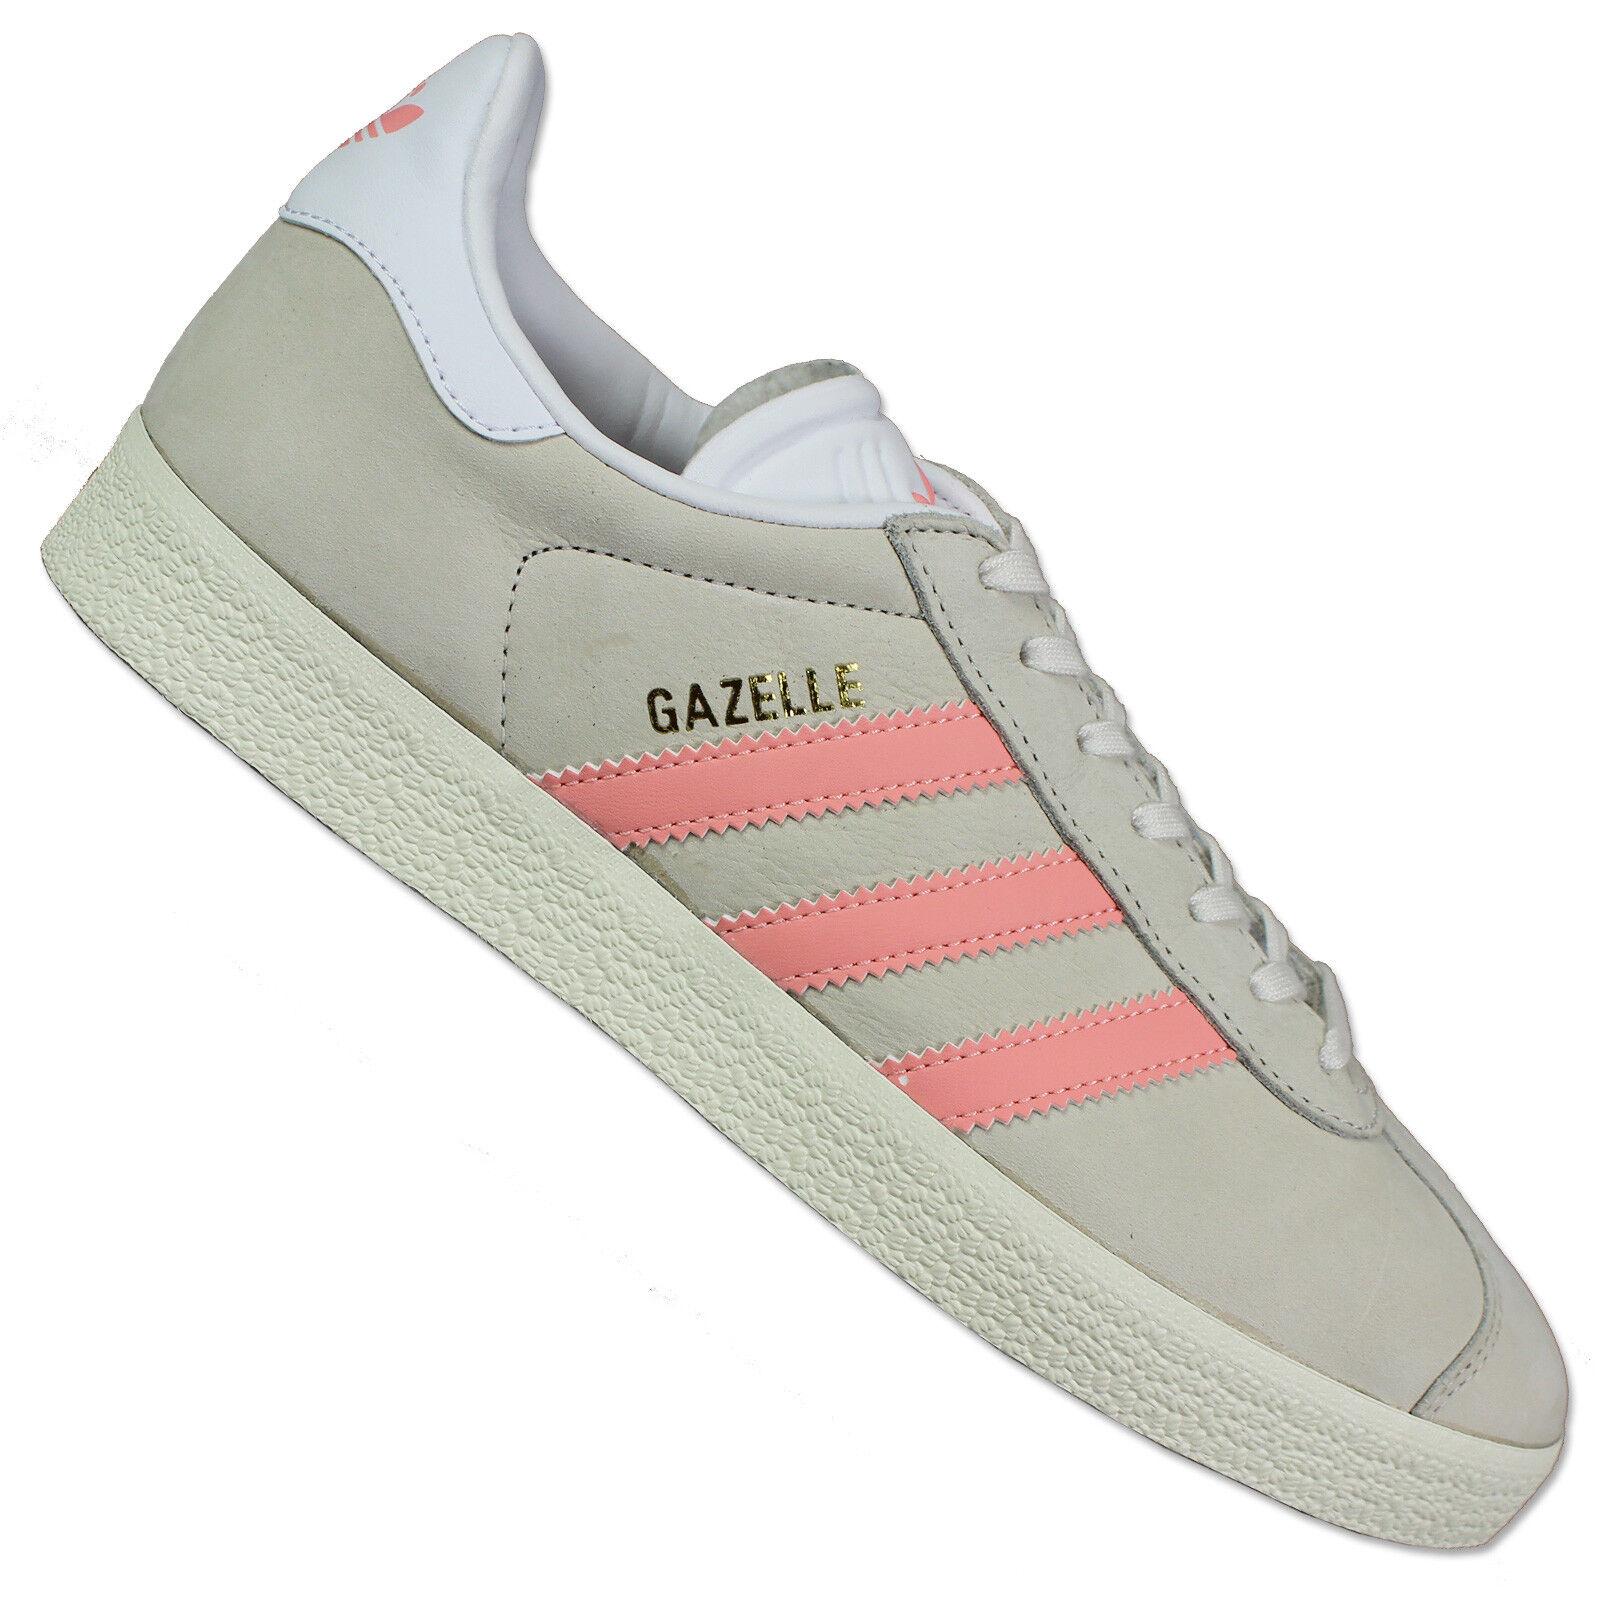 Adidas Originals gacela cortos ocio zapatos Chalk Chalk Chalk blanco Ecru Weiss rosadodo  100% garantía genuina de contador